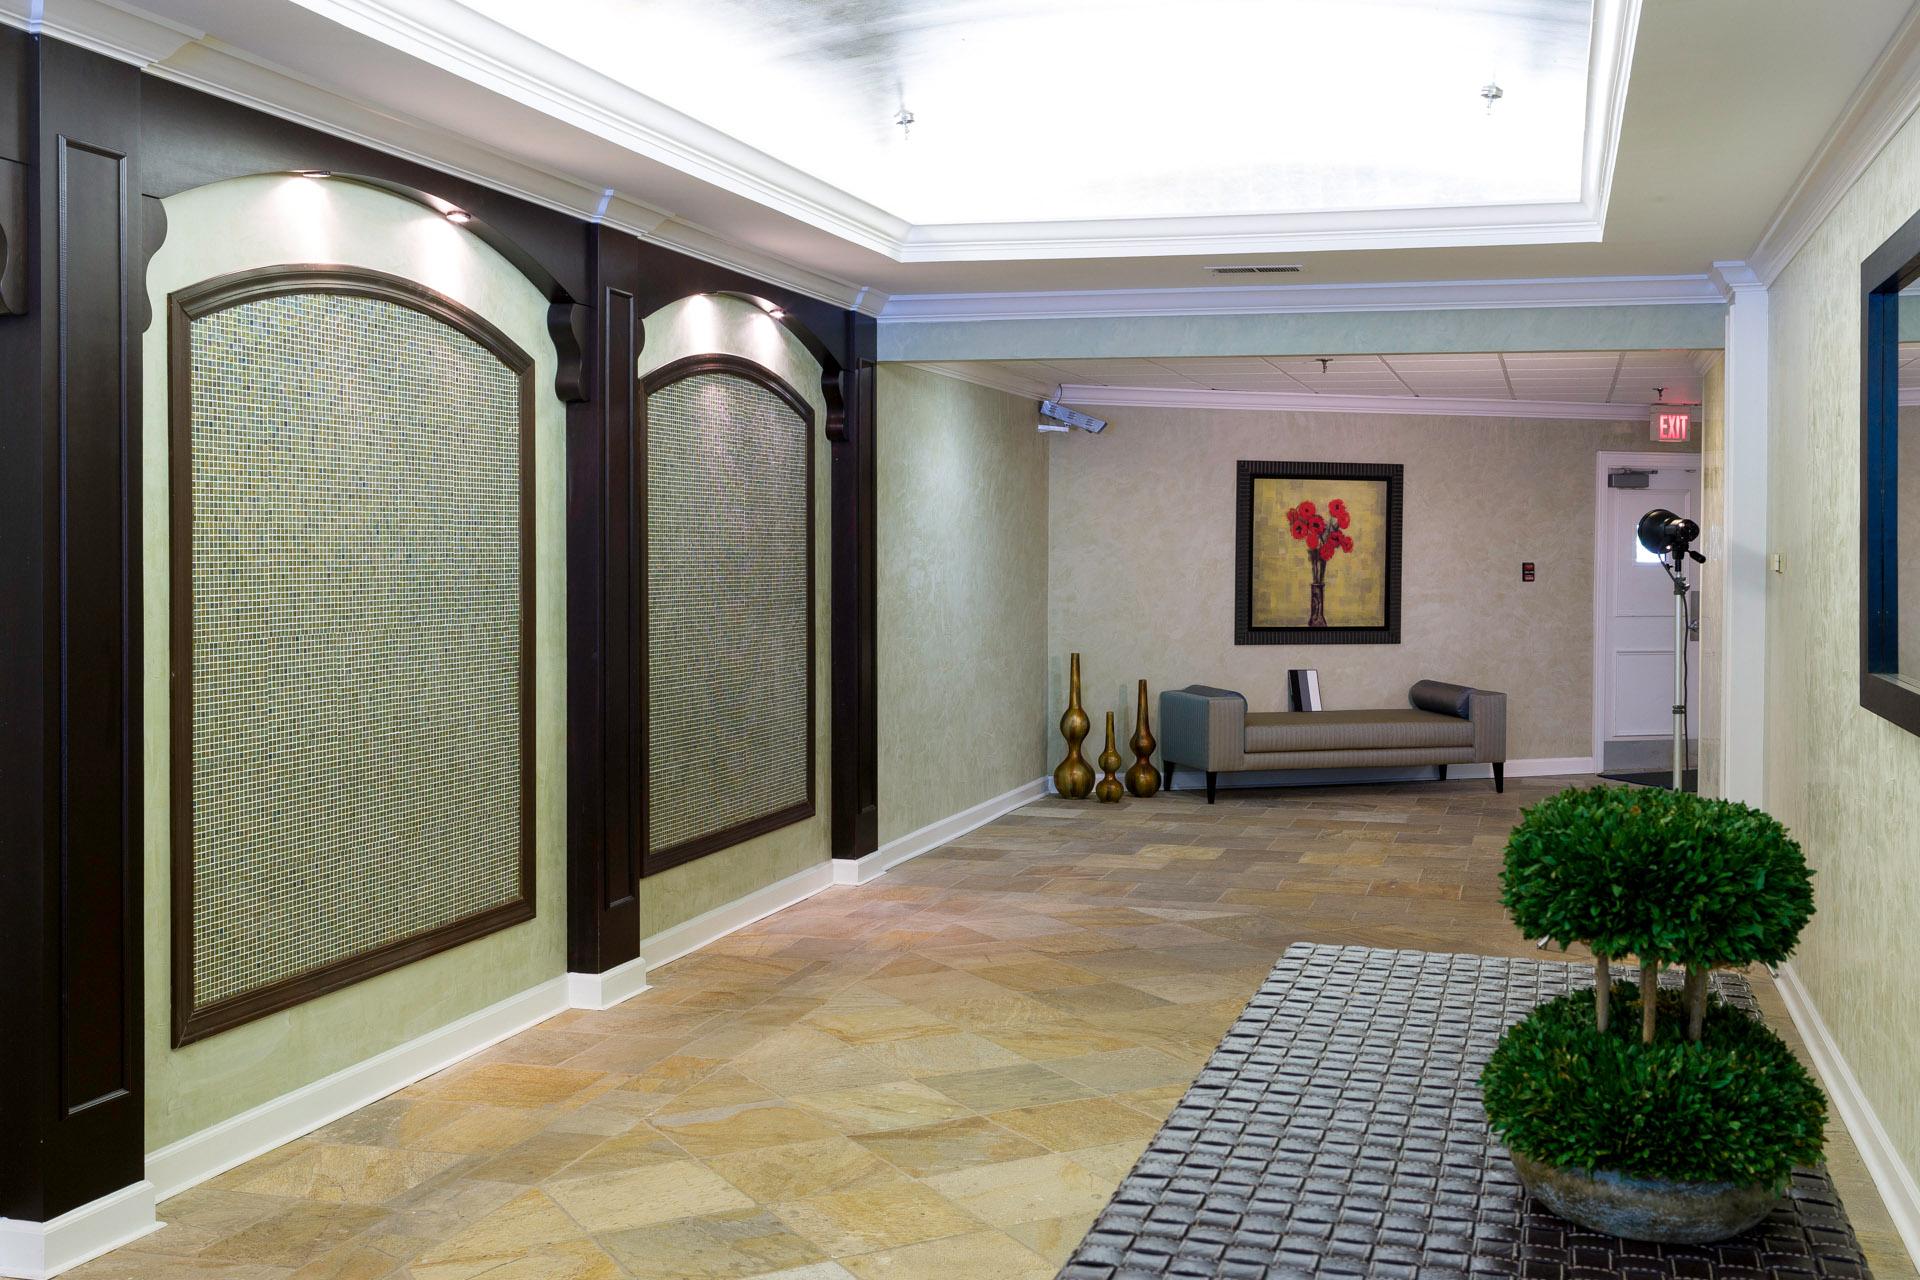 Photomatix Selective High Dynamic Range for Interiors